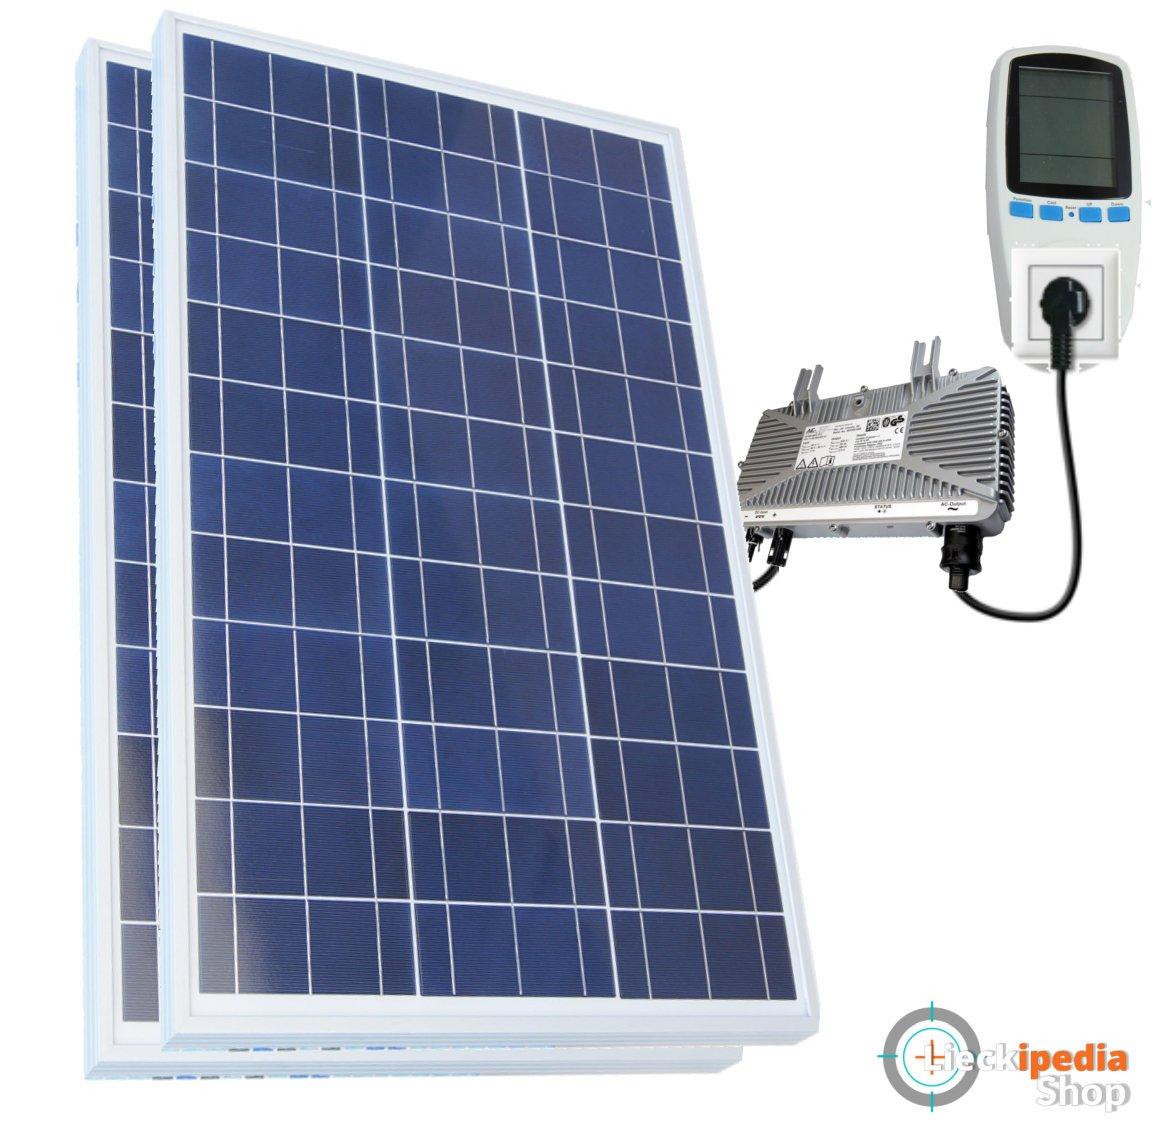 500 Watt Plug&Play-Solaranlage, poly, für die Steckdose, Konverter Komplettpaket